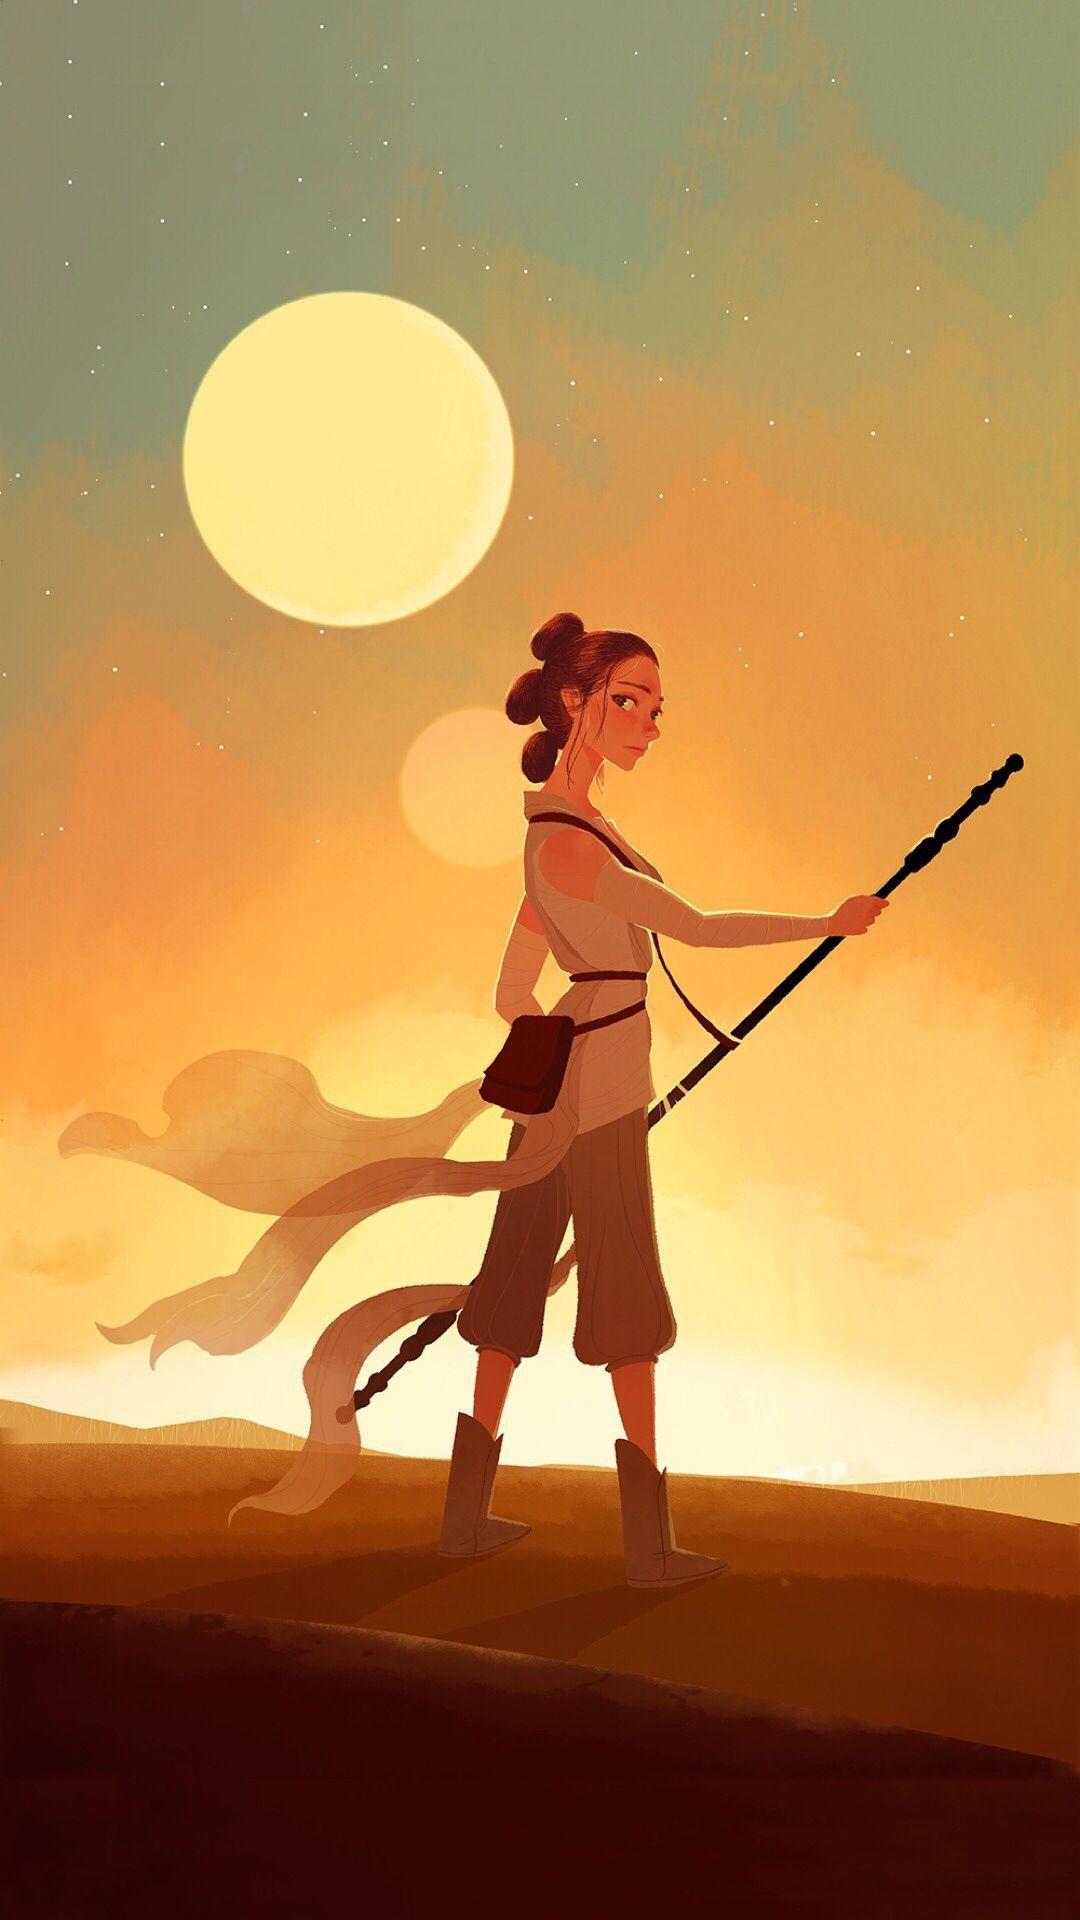 Rey Star Wars Phone Wallpapers Top Free Rey Star Wars Phone Backgrounds Wallpaperaccess